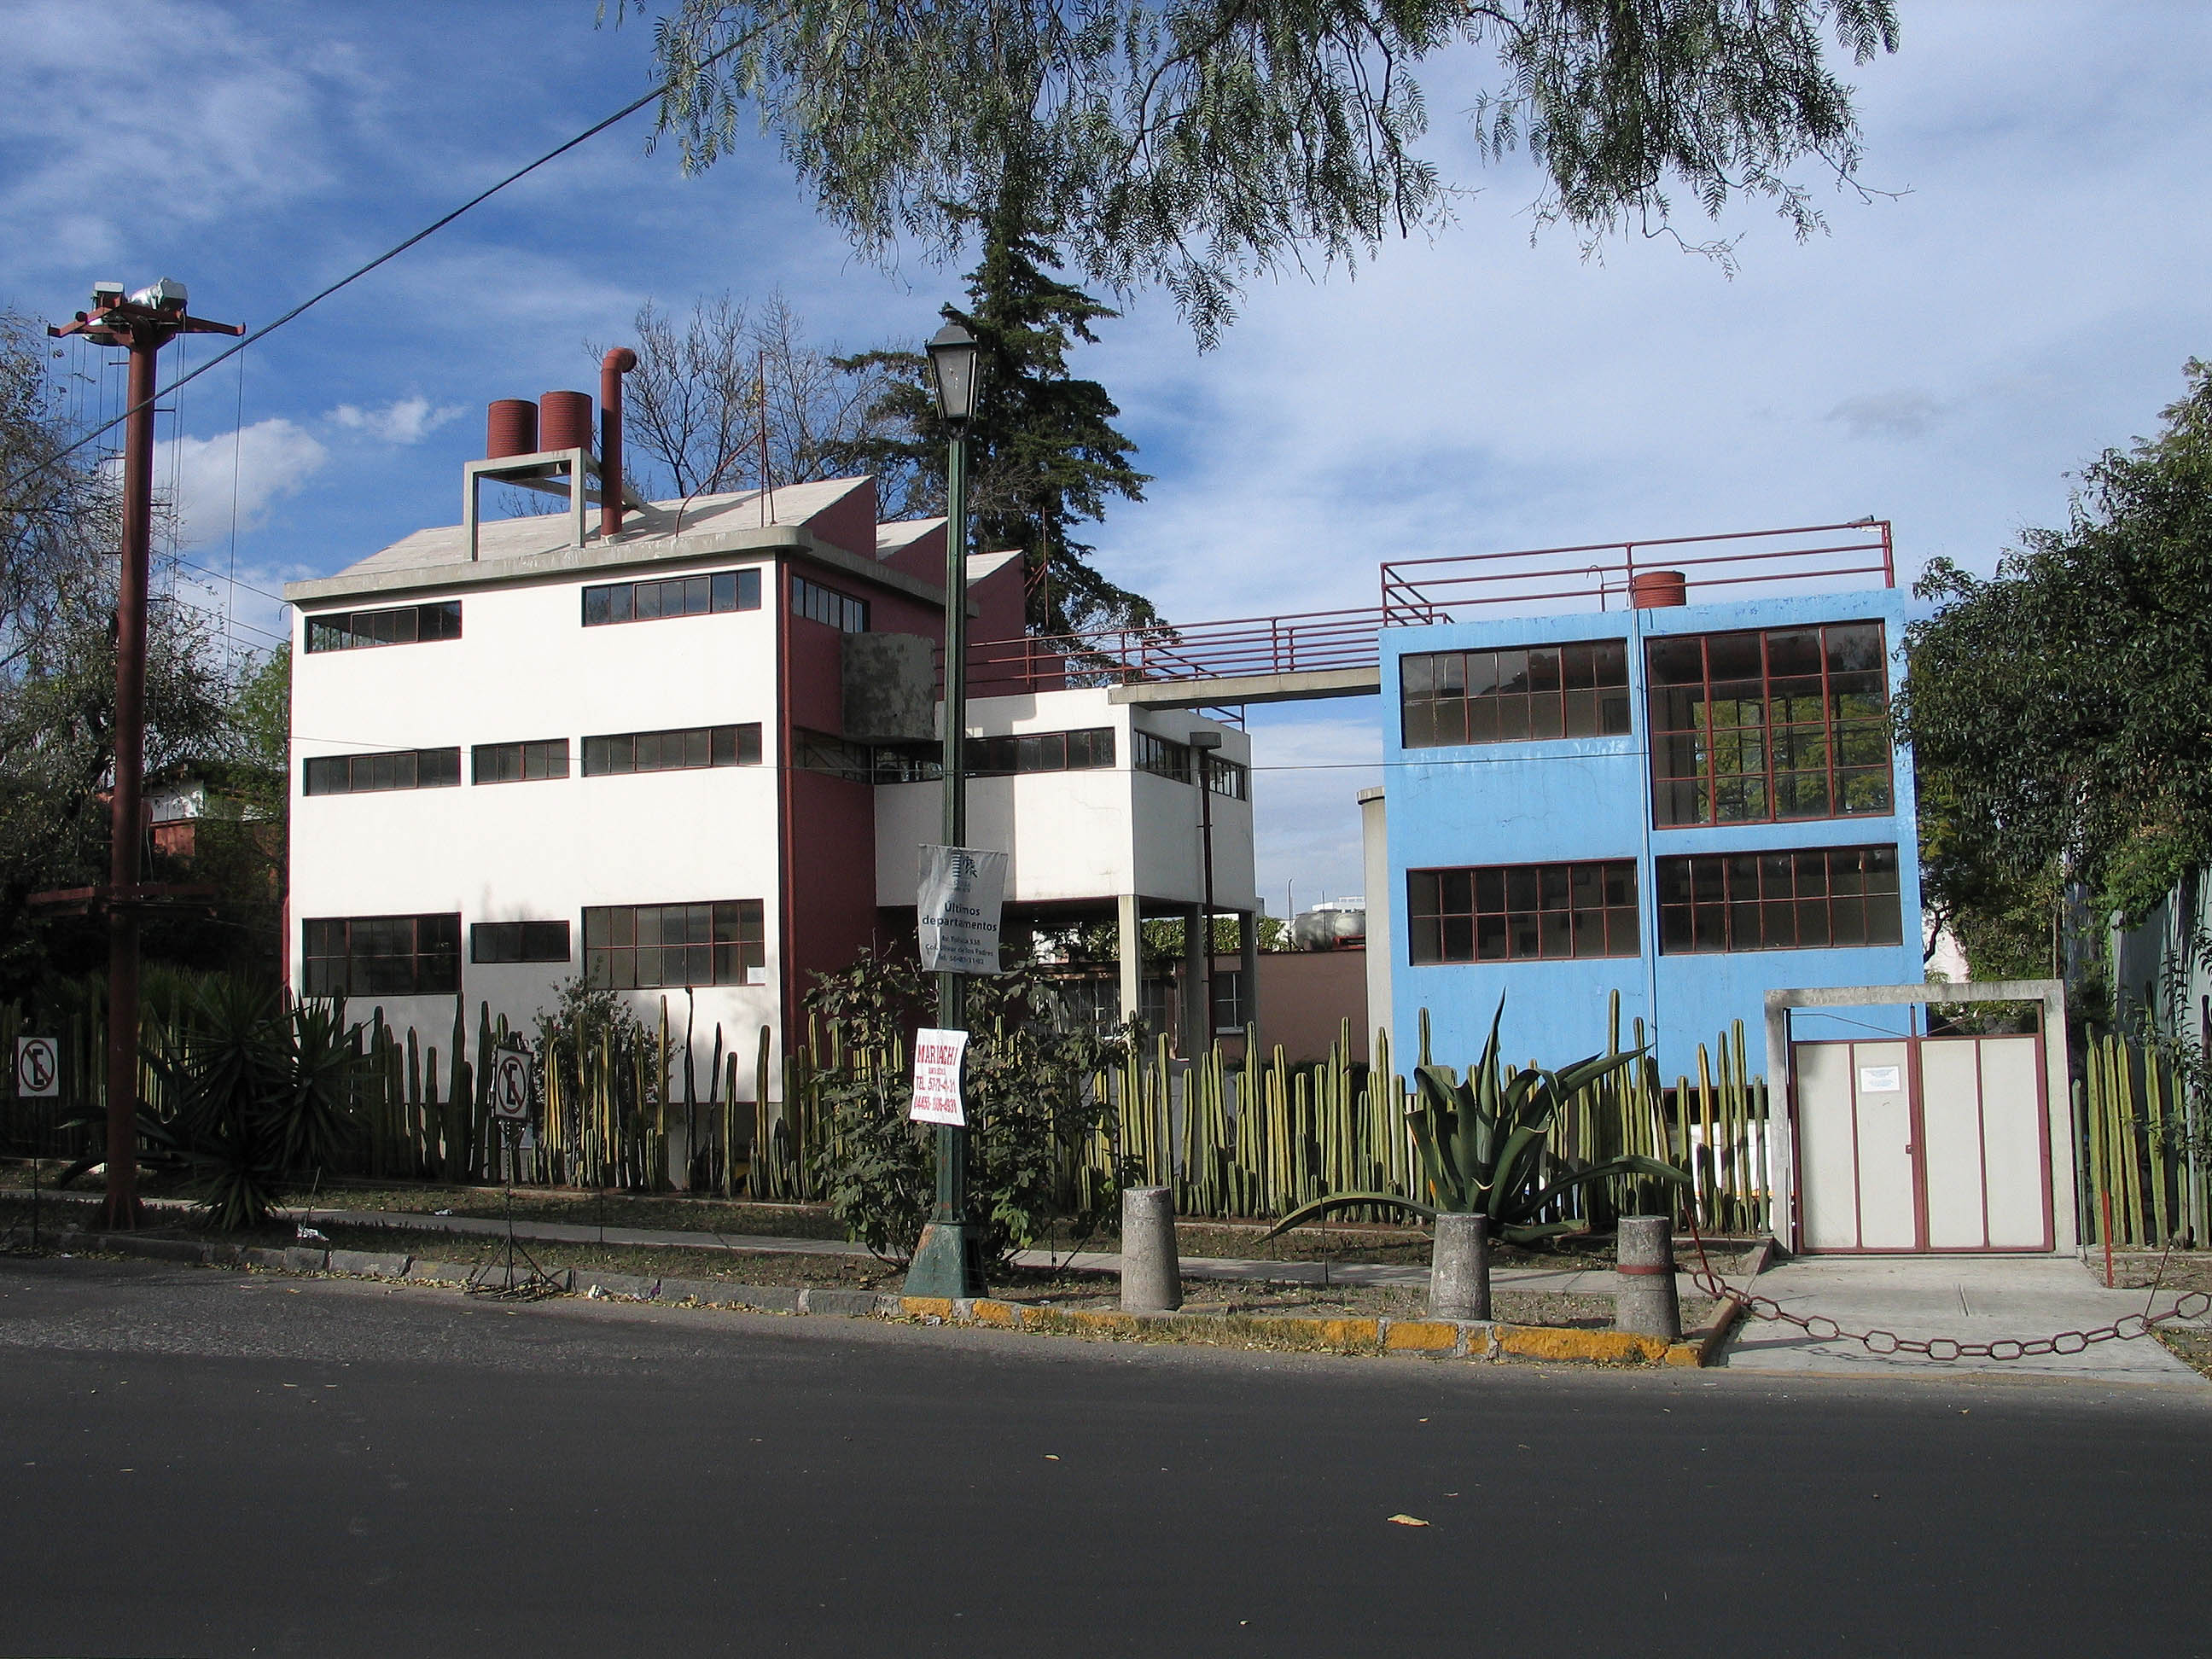 Frida Kahlo and Diego Rivera House